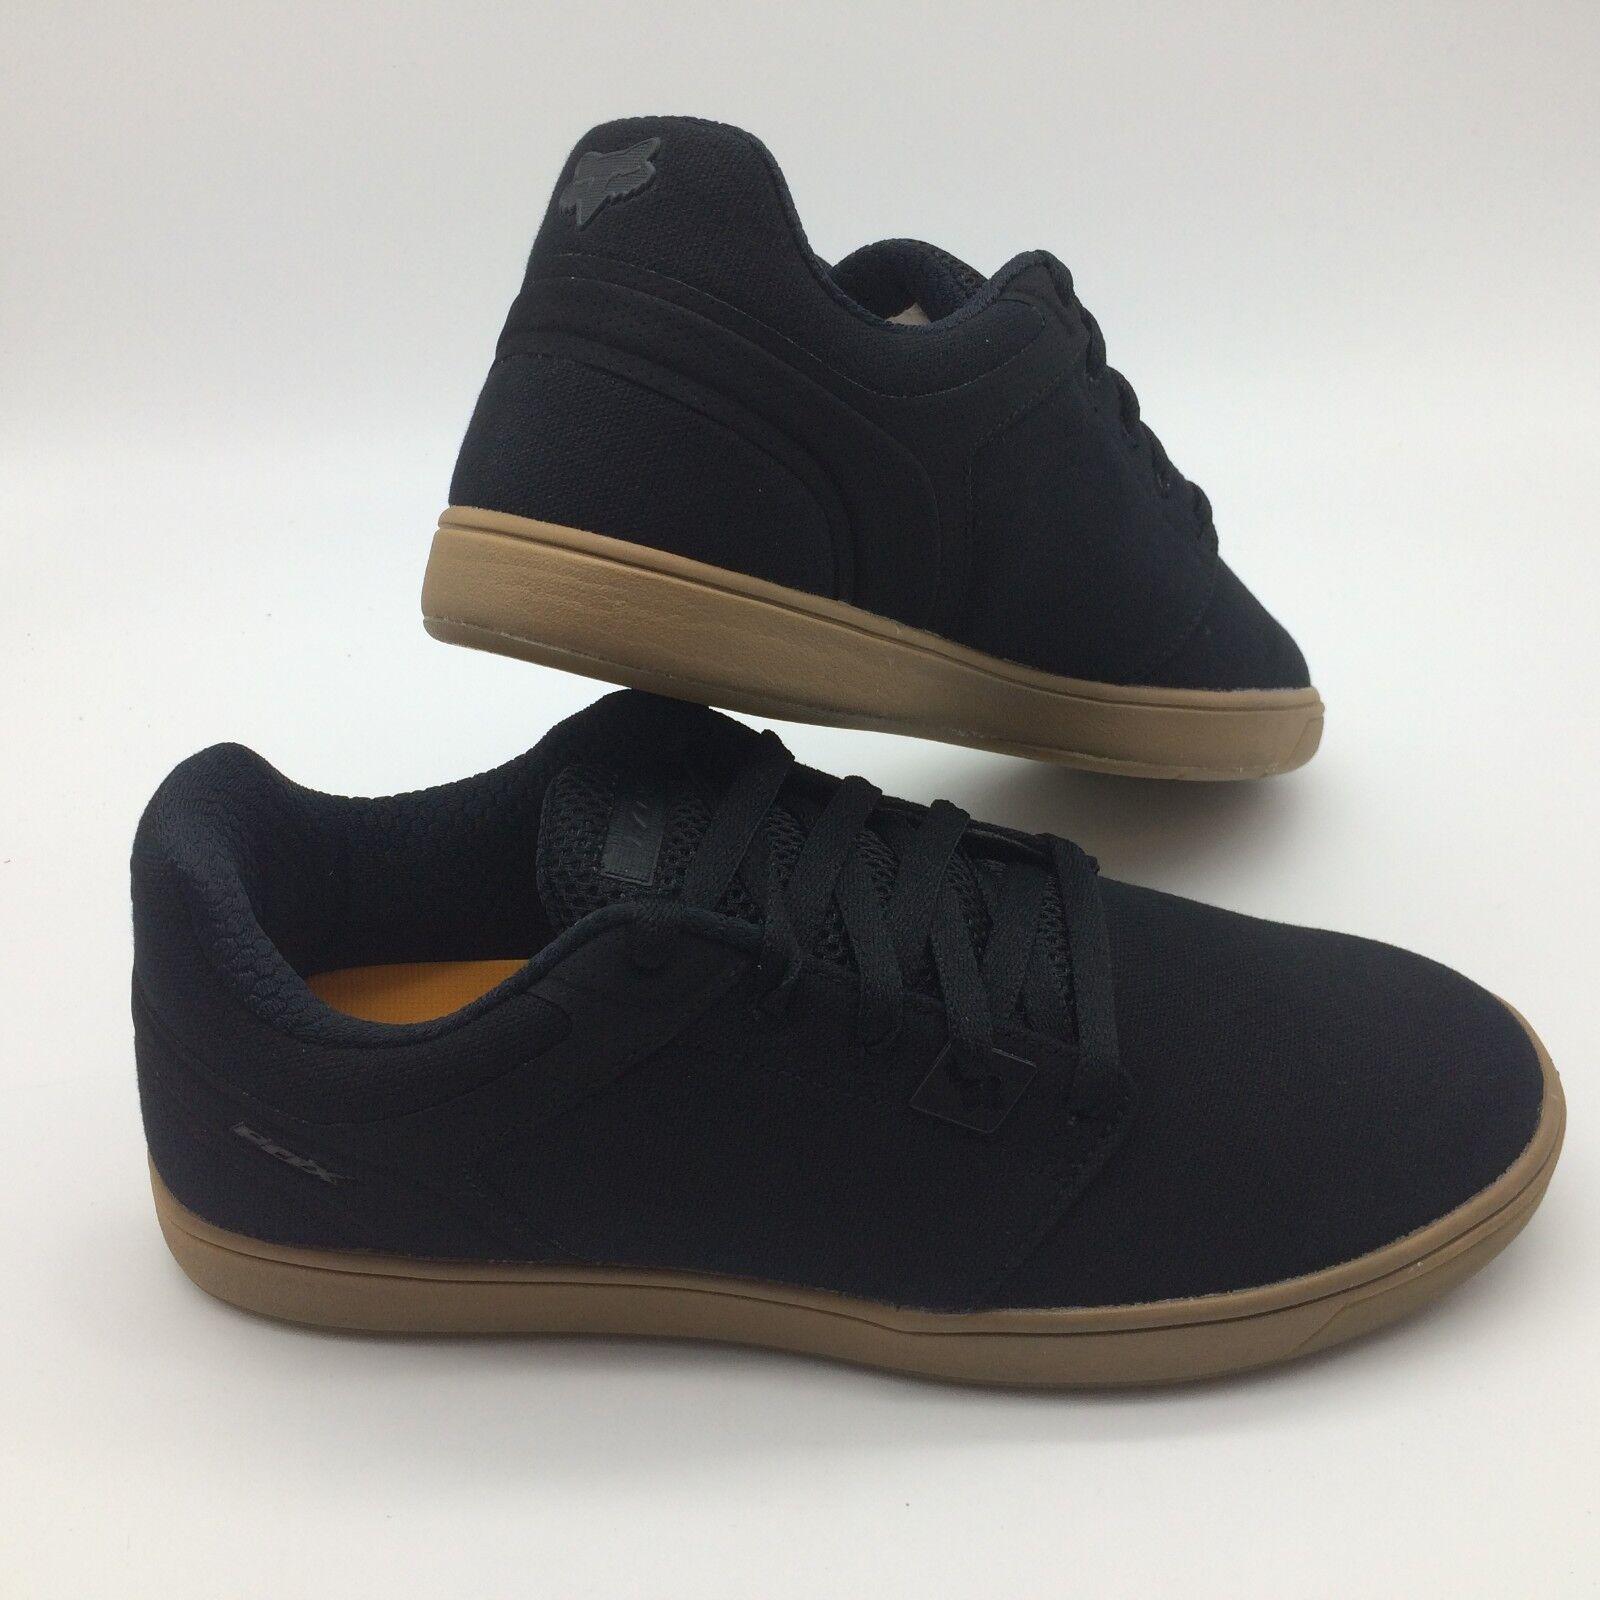 Nike Air Max Tavas Schuhe beachte Beschreibung